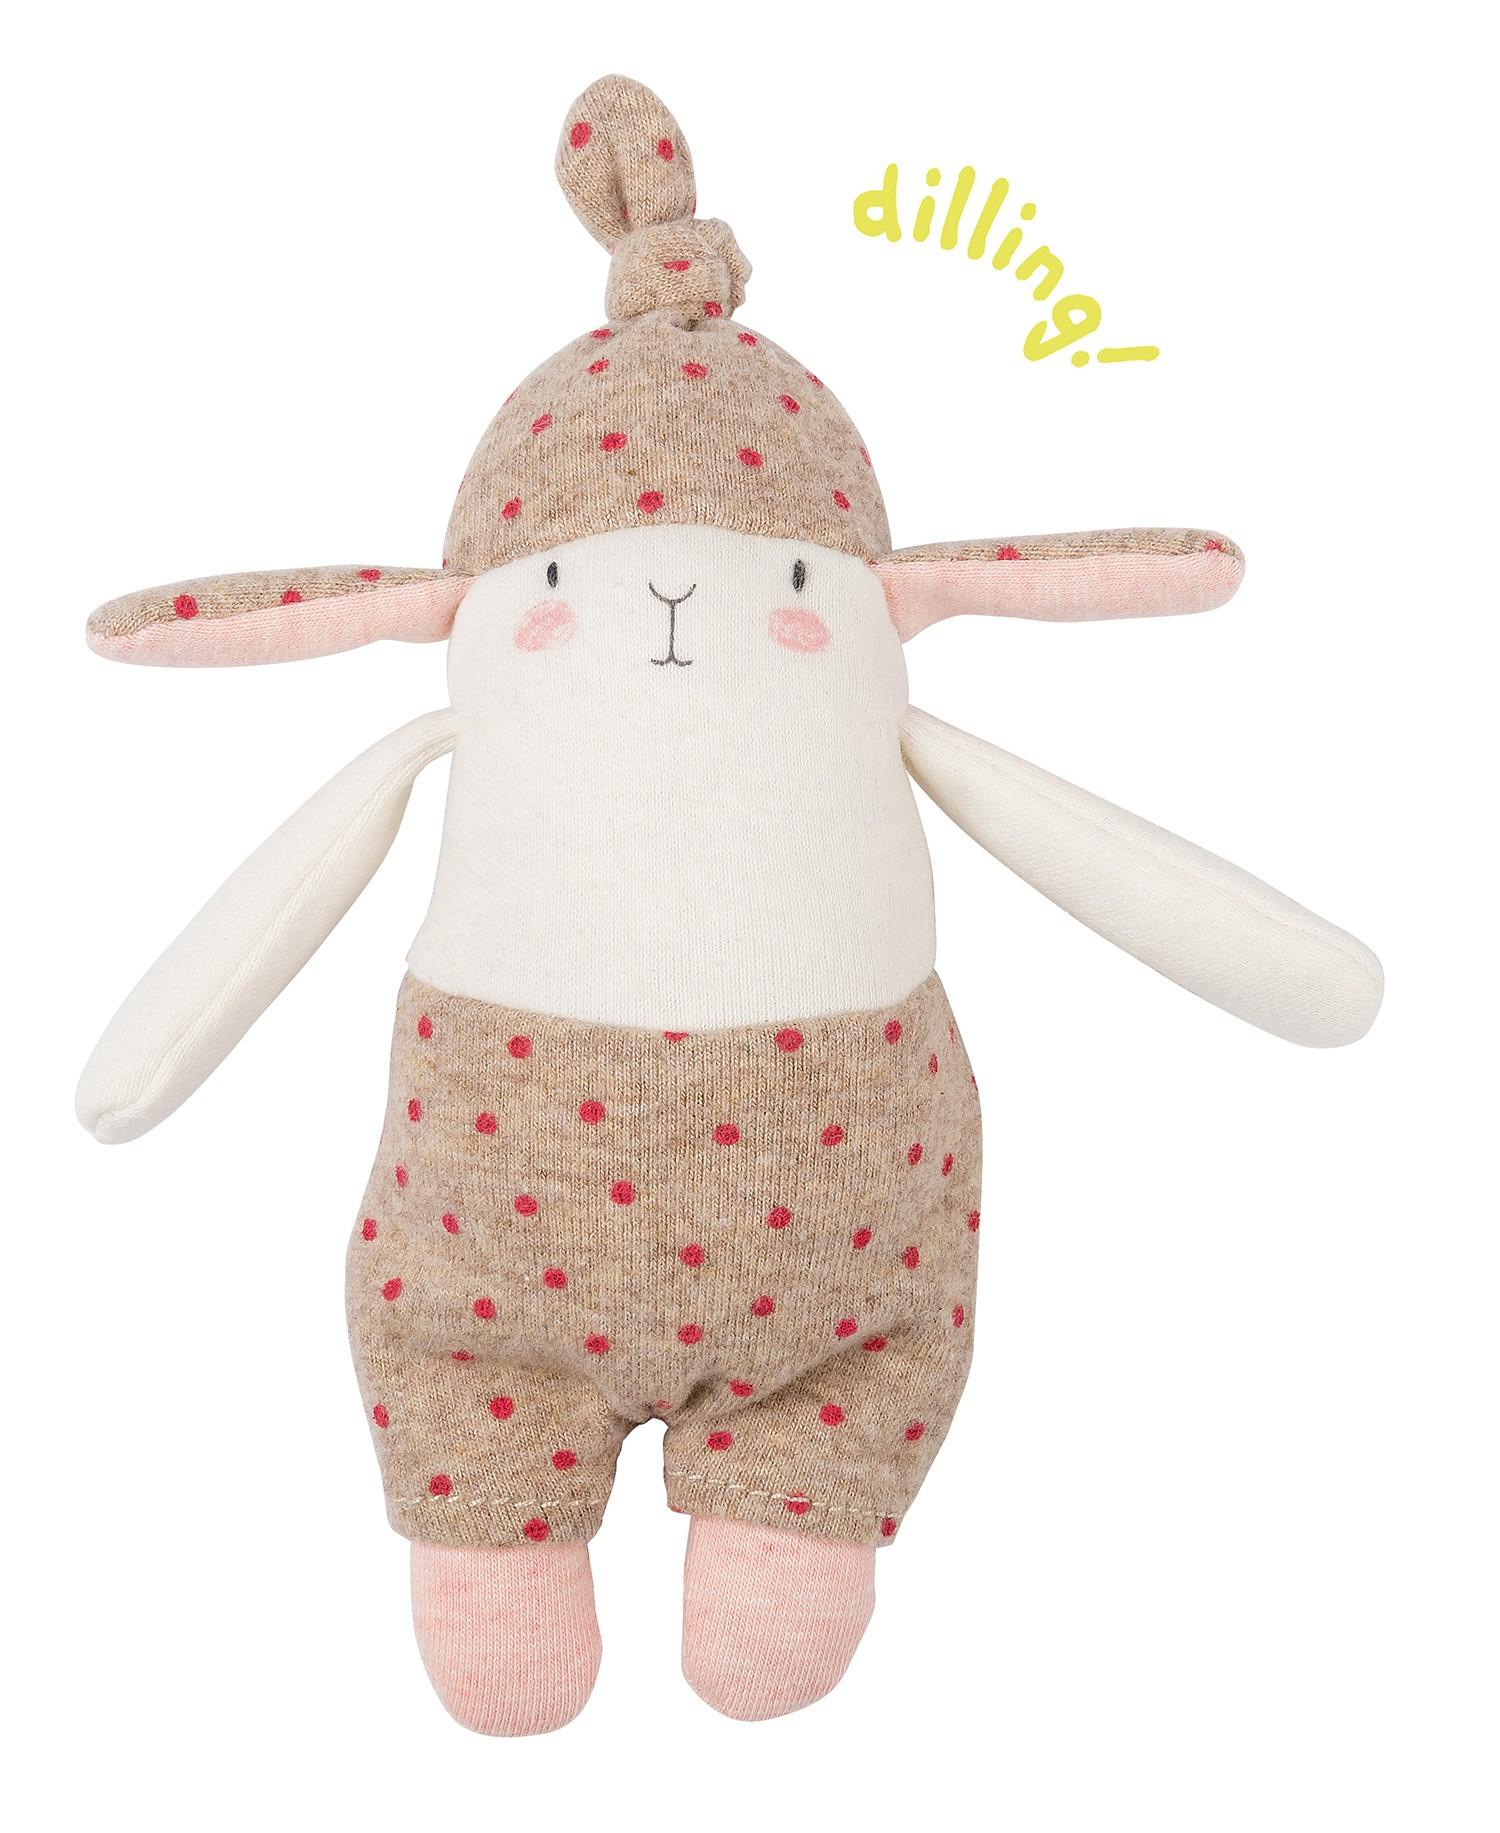 Moulin Roty Rattle - Lulu The Rabbit à Lapin Lulu